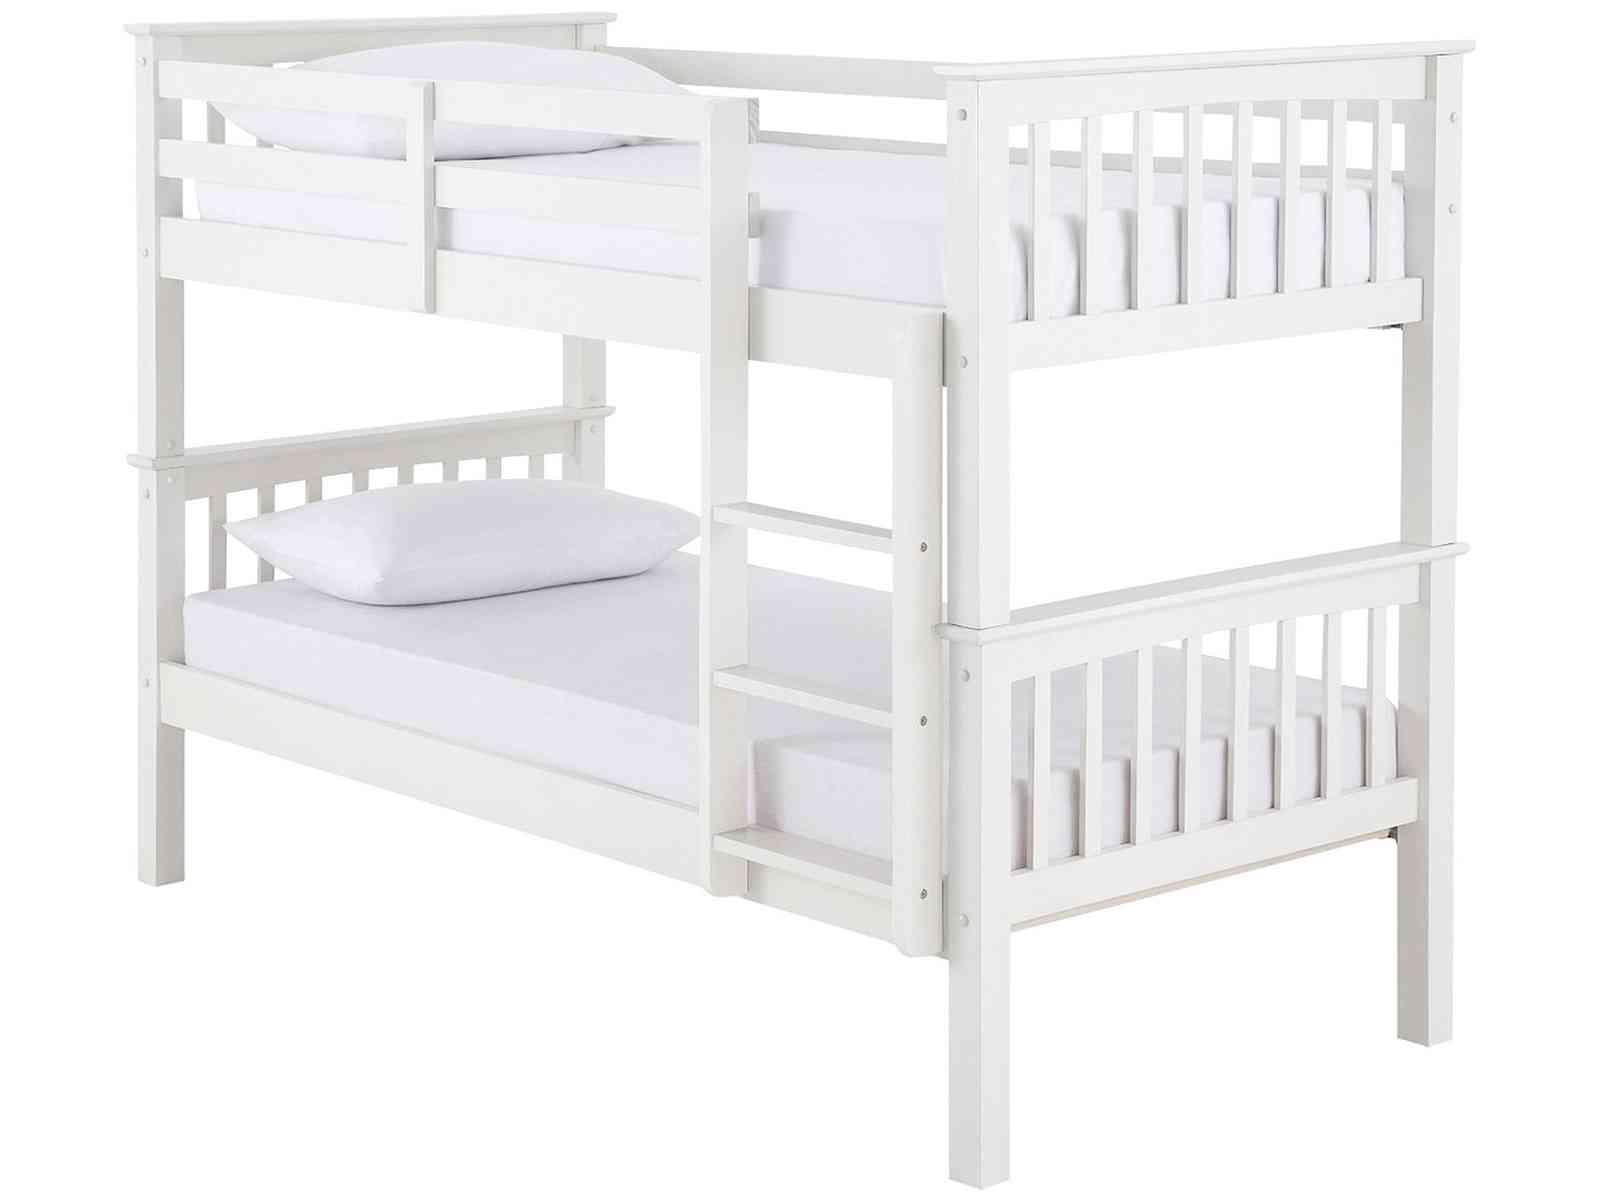 Gfw The Furniture Warehouse Novaro Bunk Bed